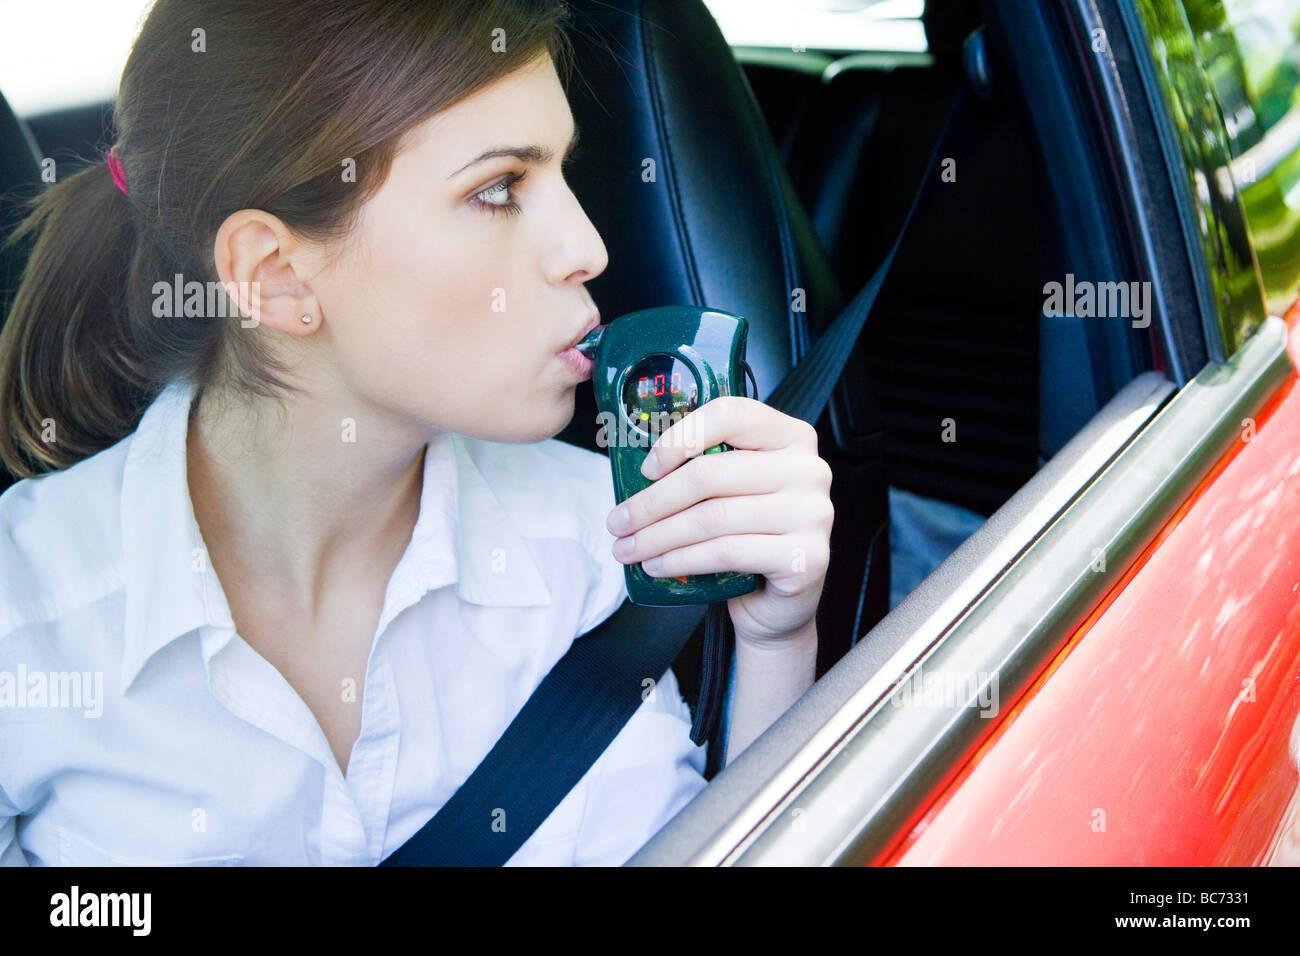 woman breathing into breathalyzer - Stock Image